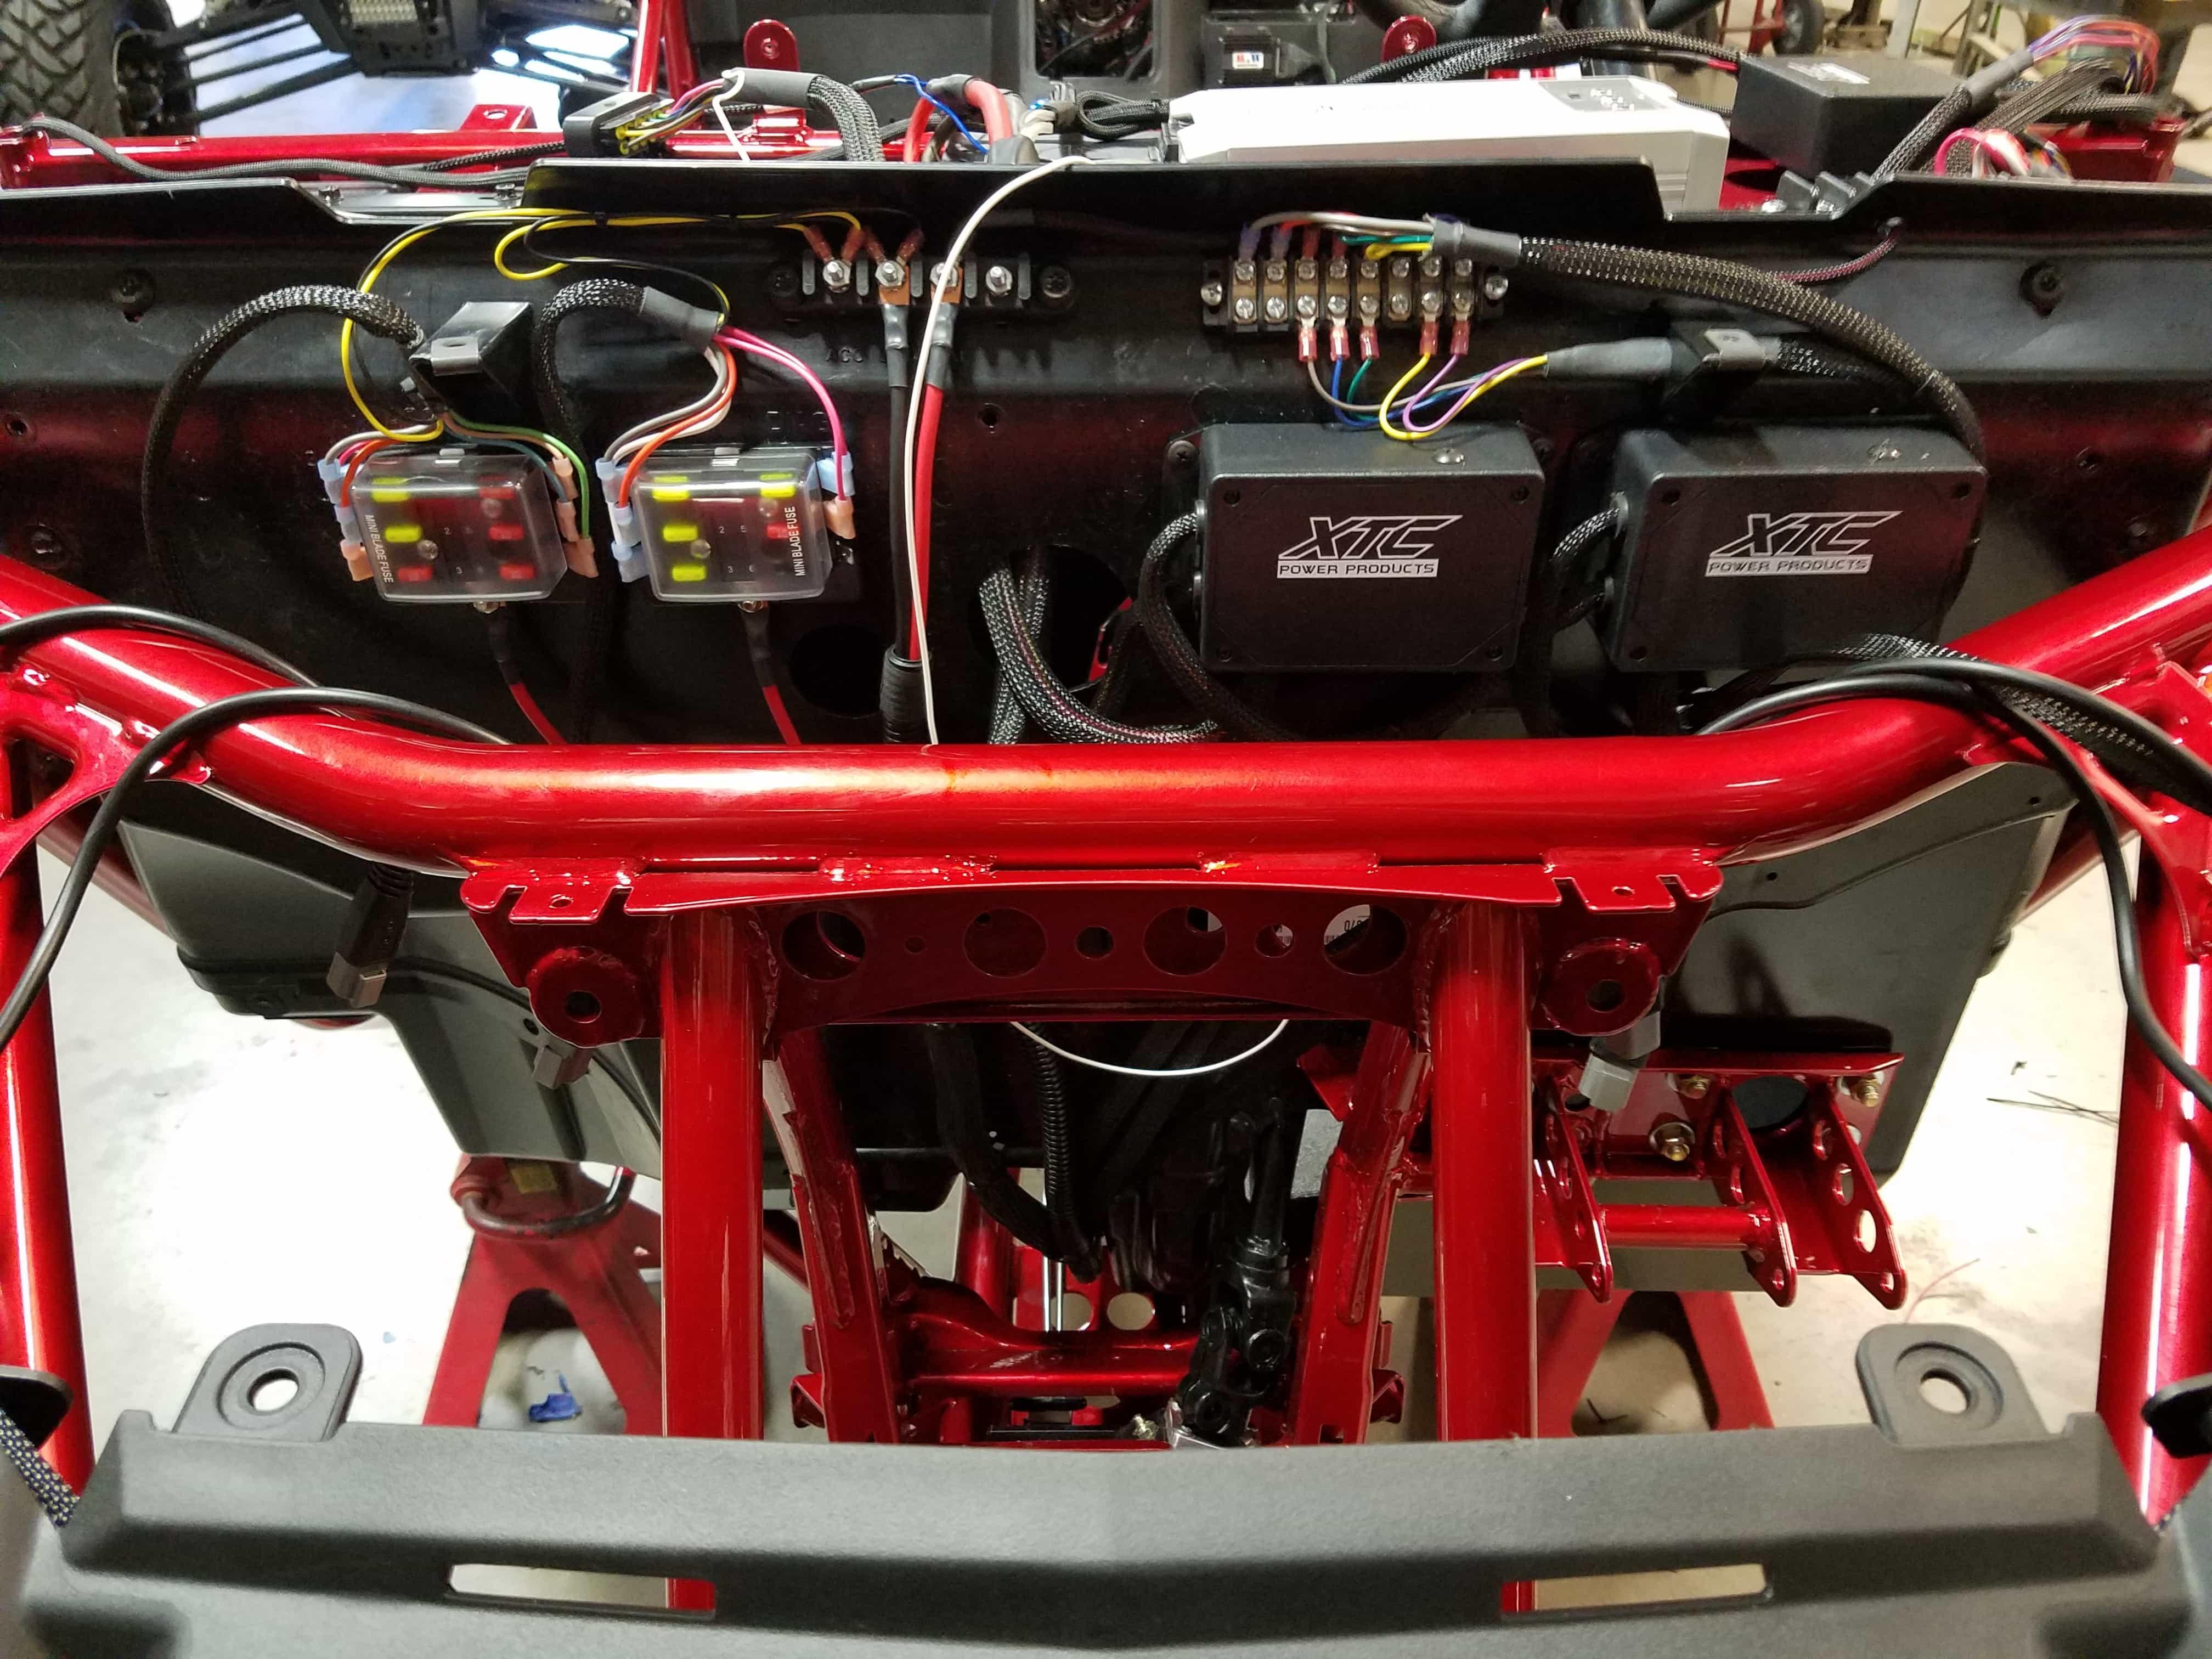 XTC Power Products' 475 HP Subaru-Powered